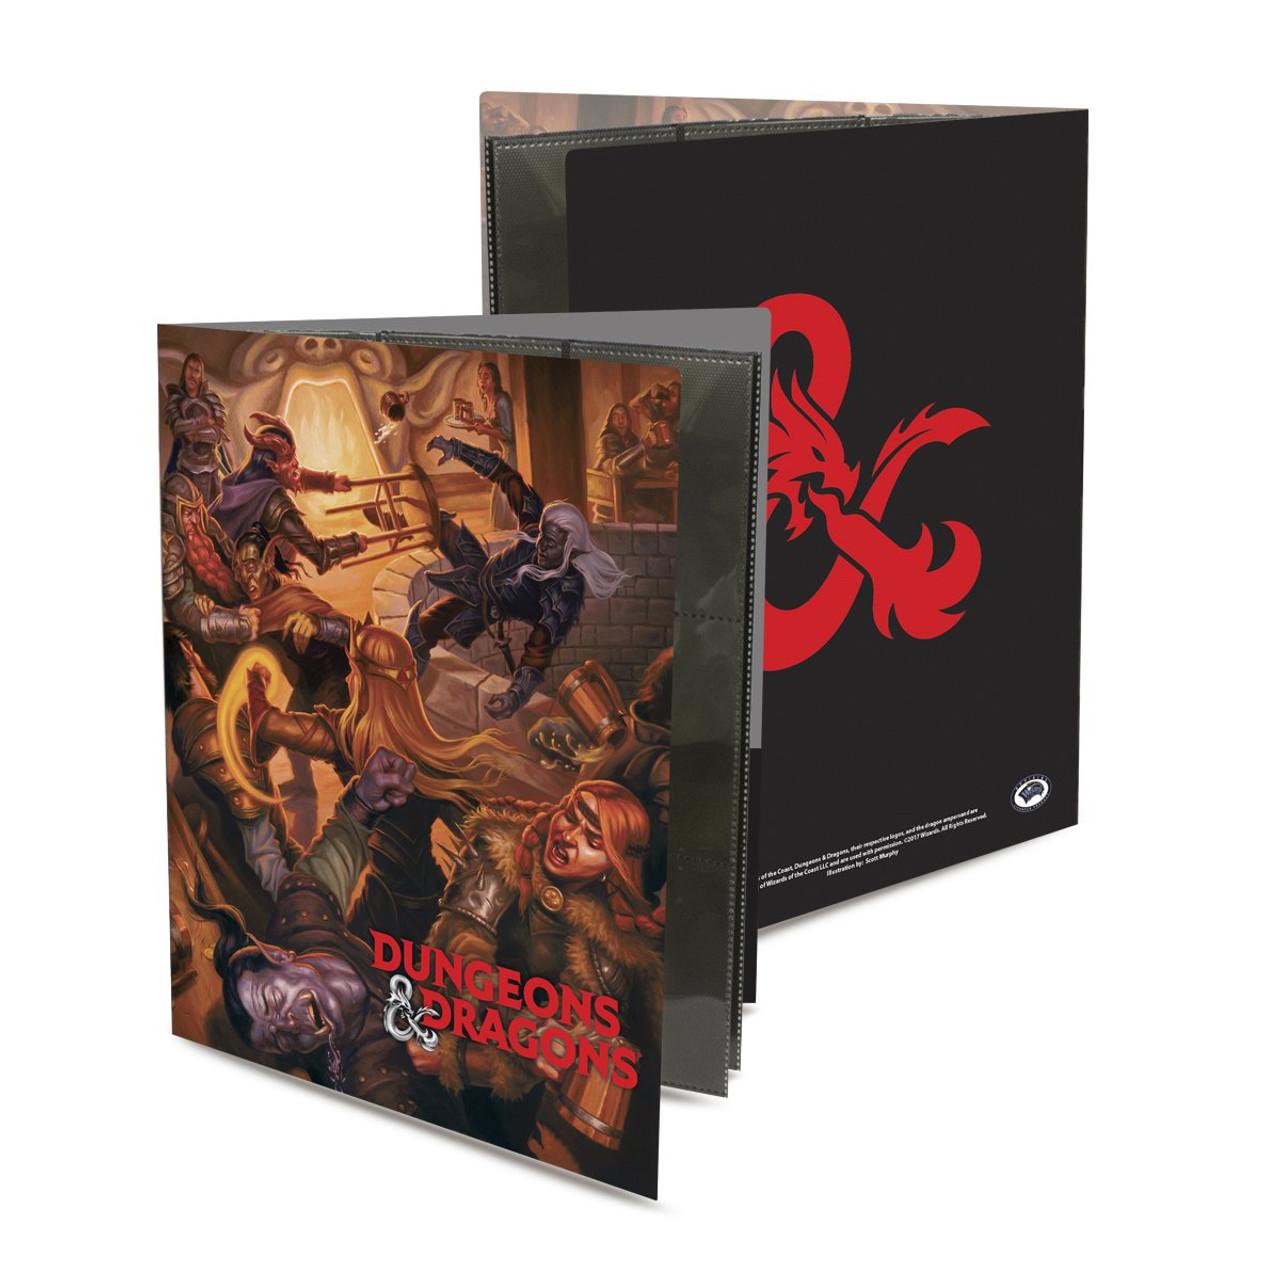 Dungeons & Dragons 9 Pocket Portfolio - Tavern Brawl - Special Order